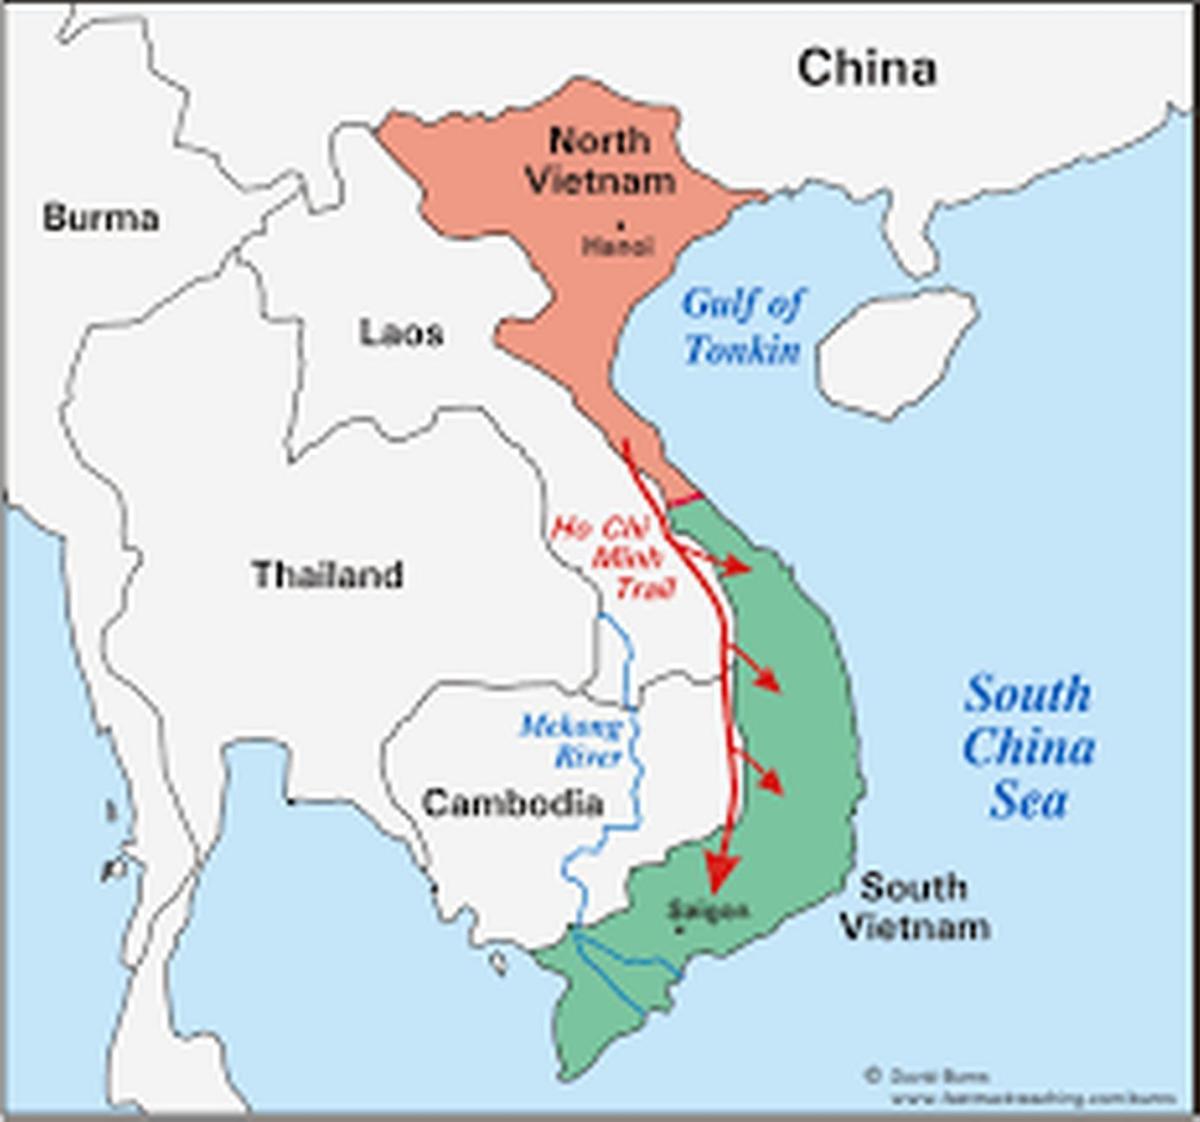 why-america-lost-the-vietnam-war-the-culprits-were-lyndon-johnson-and-richard-nixon